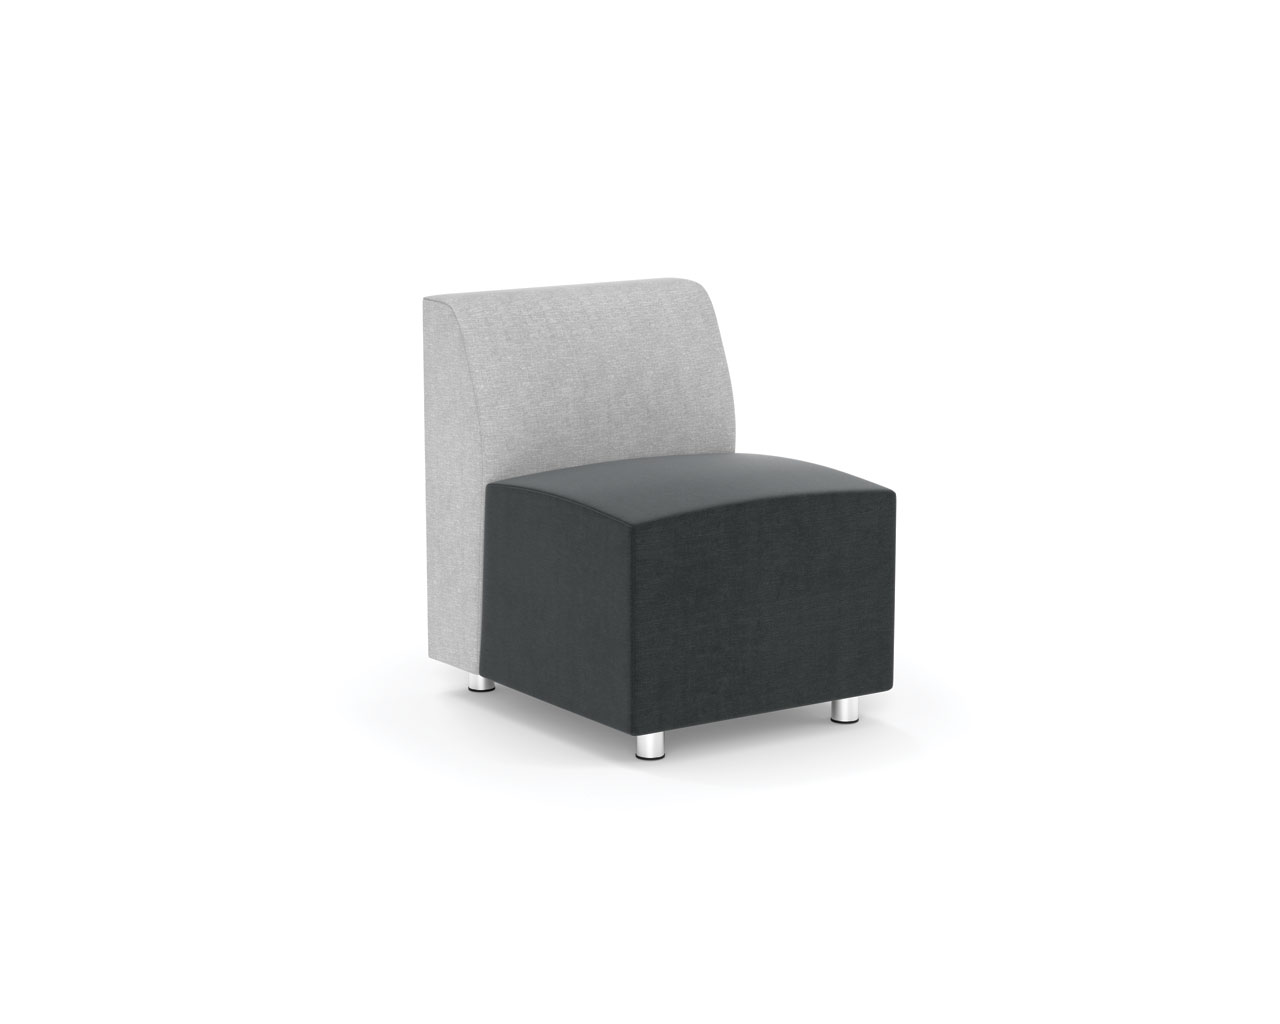 Brighton Modular Armless Chair Source Office Furniture